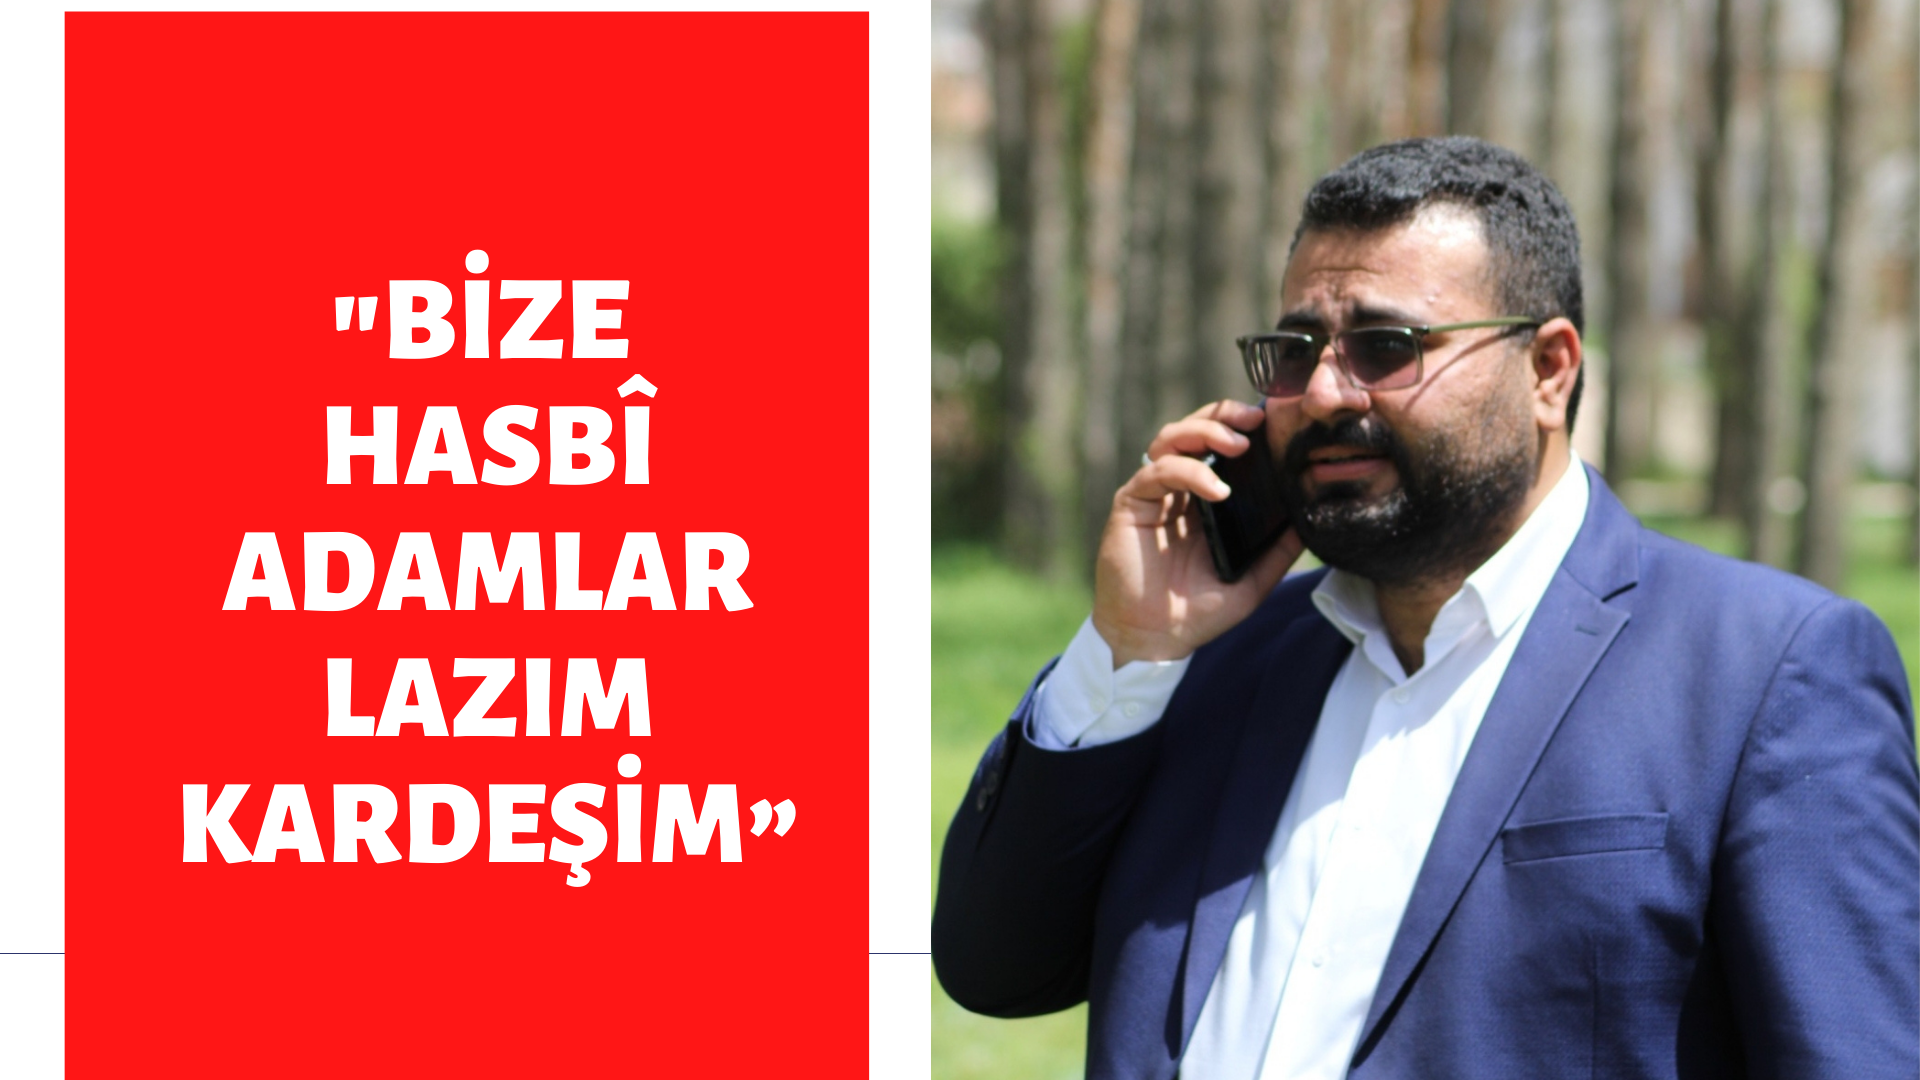 """BİZE HASBÎ ADAMLAR LAZIM KARDEŞİM"